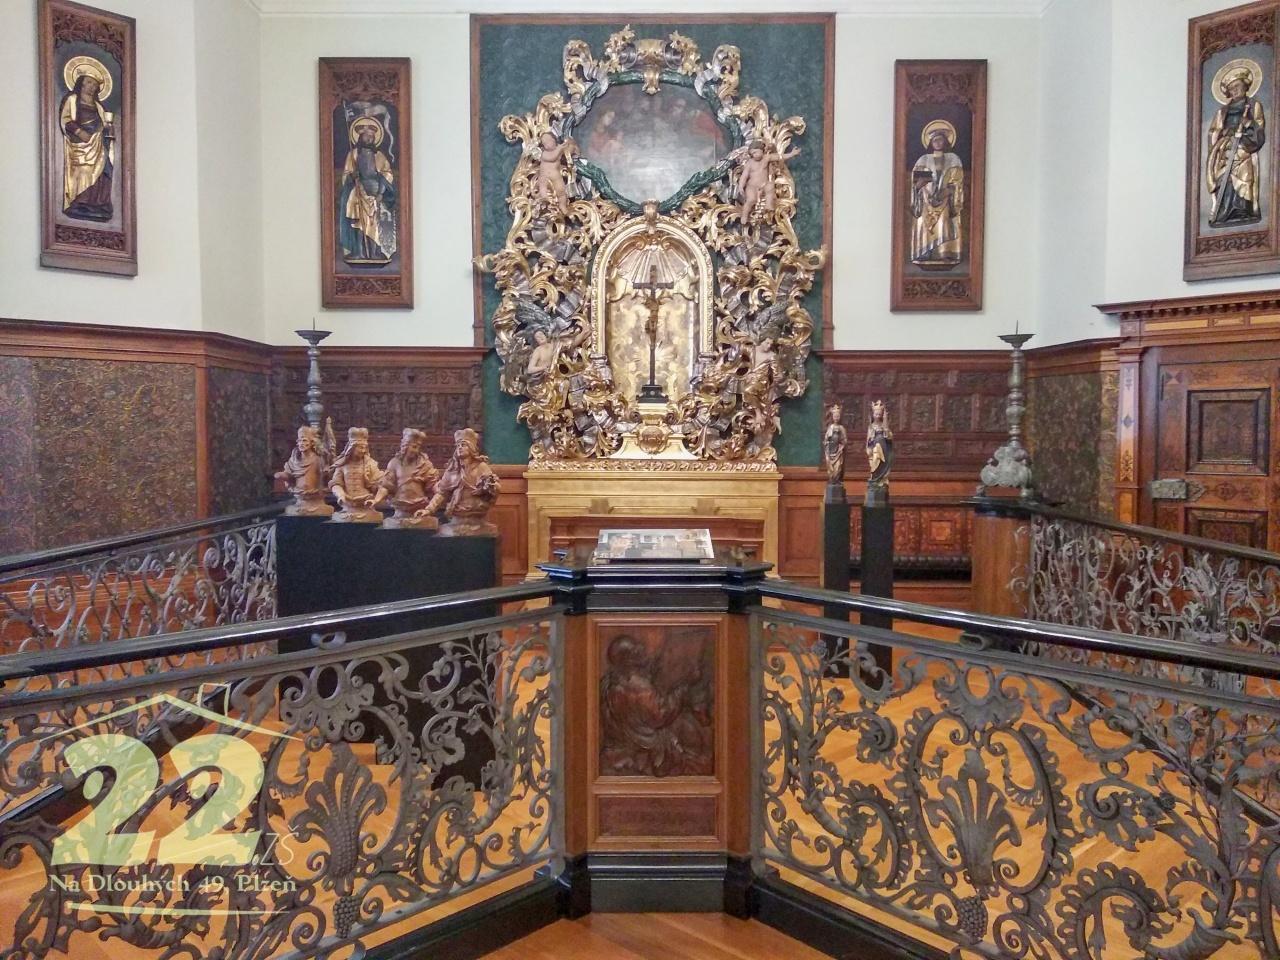 Exkurze do Západočeského muzea